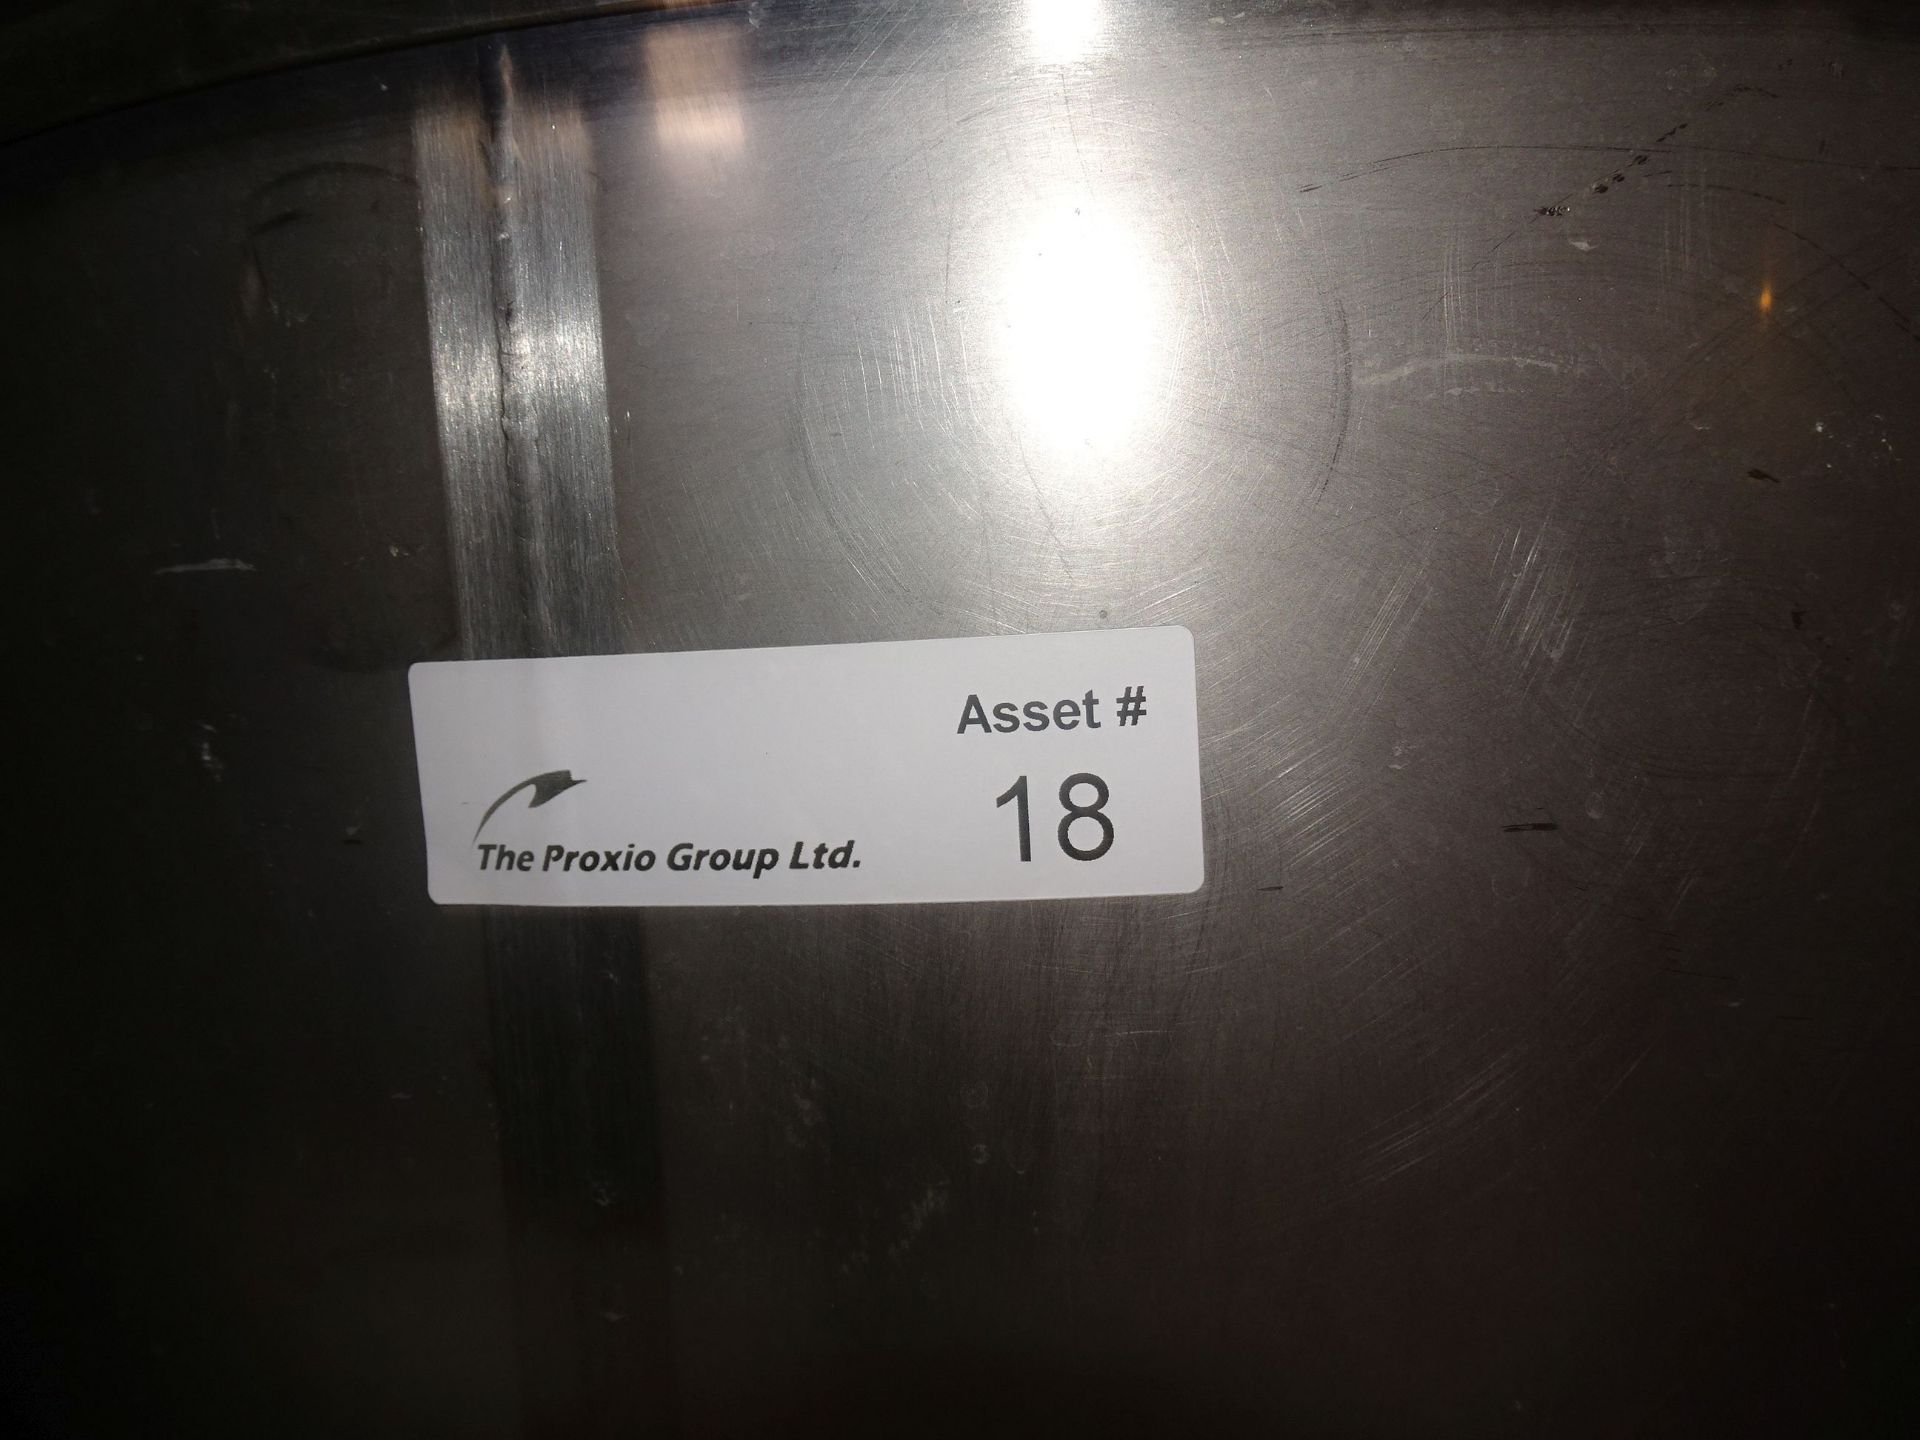 Lot 16 - Stainless Steel Transfer Vessel on Cart